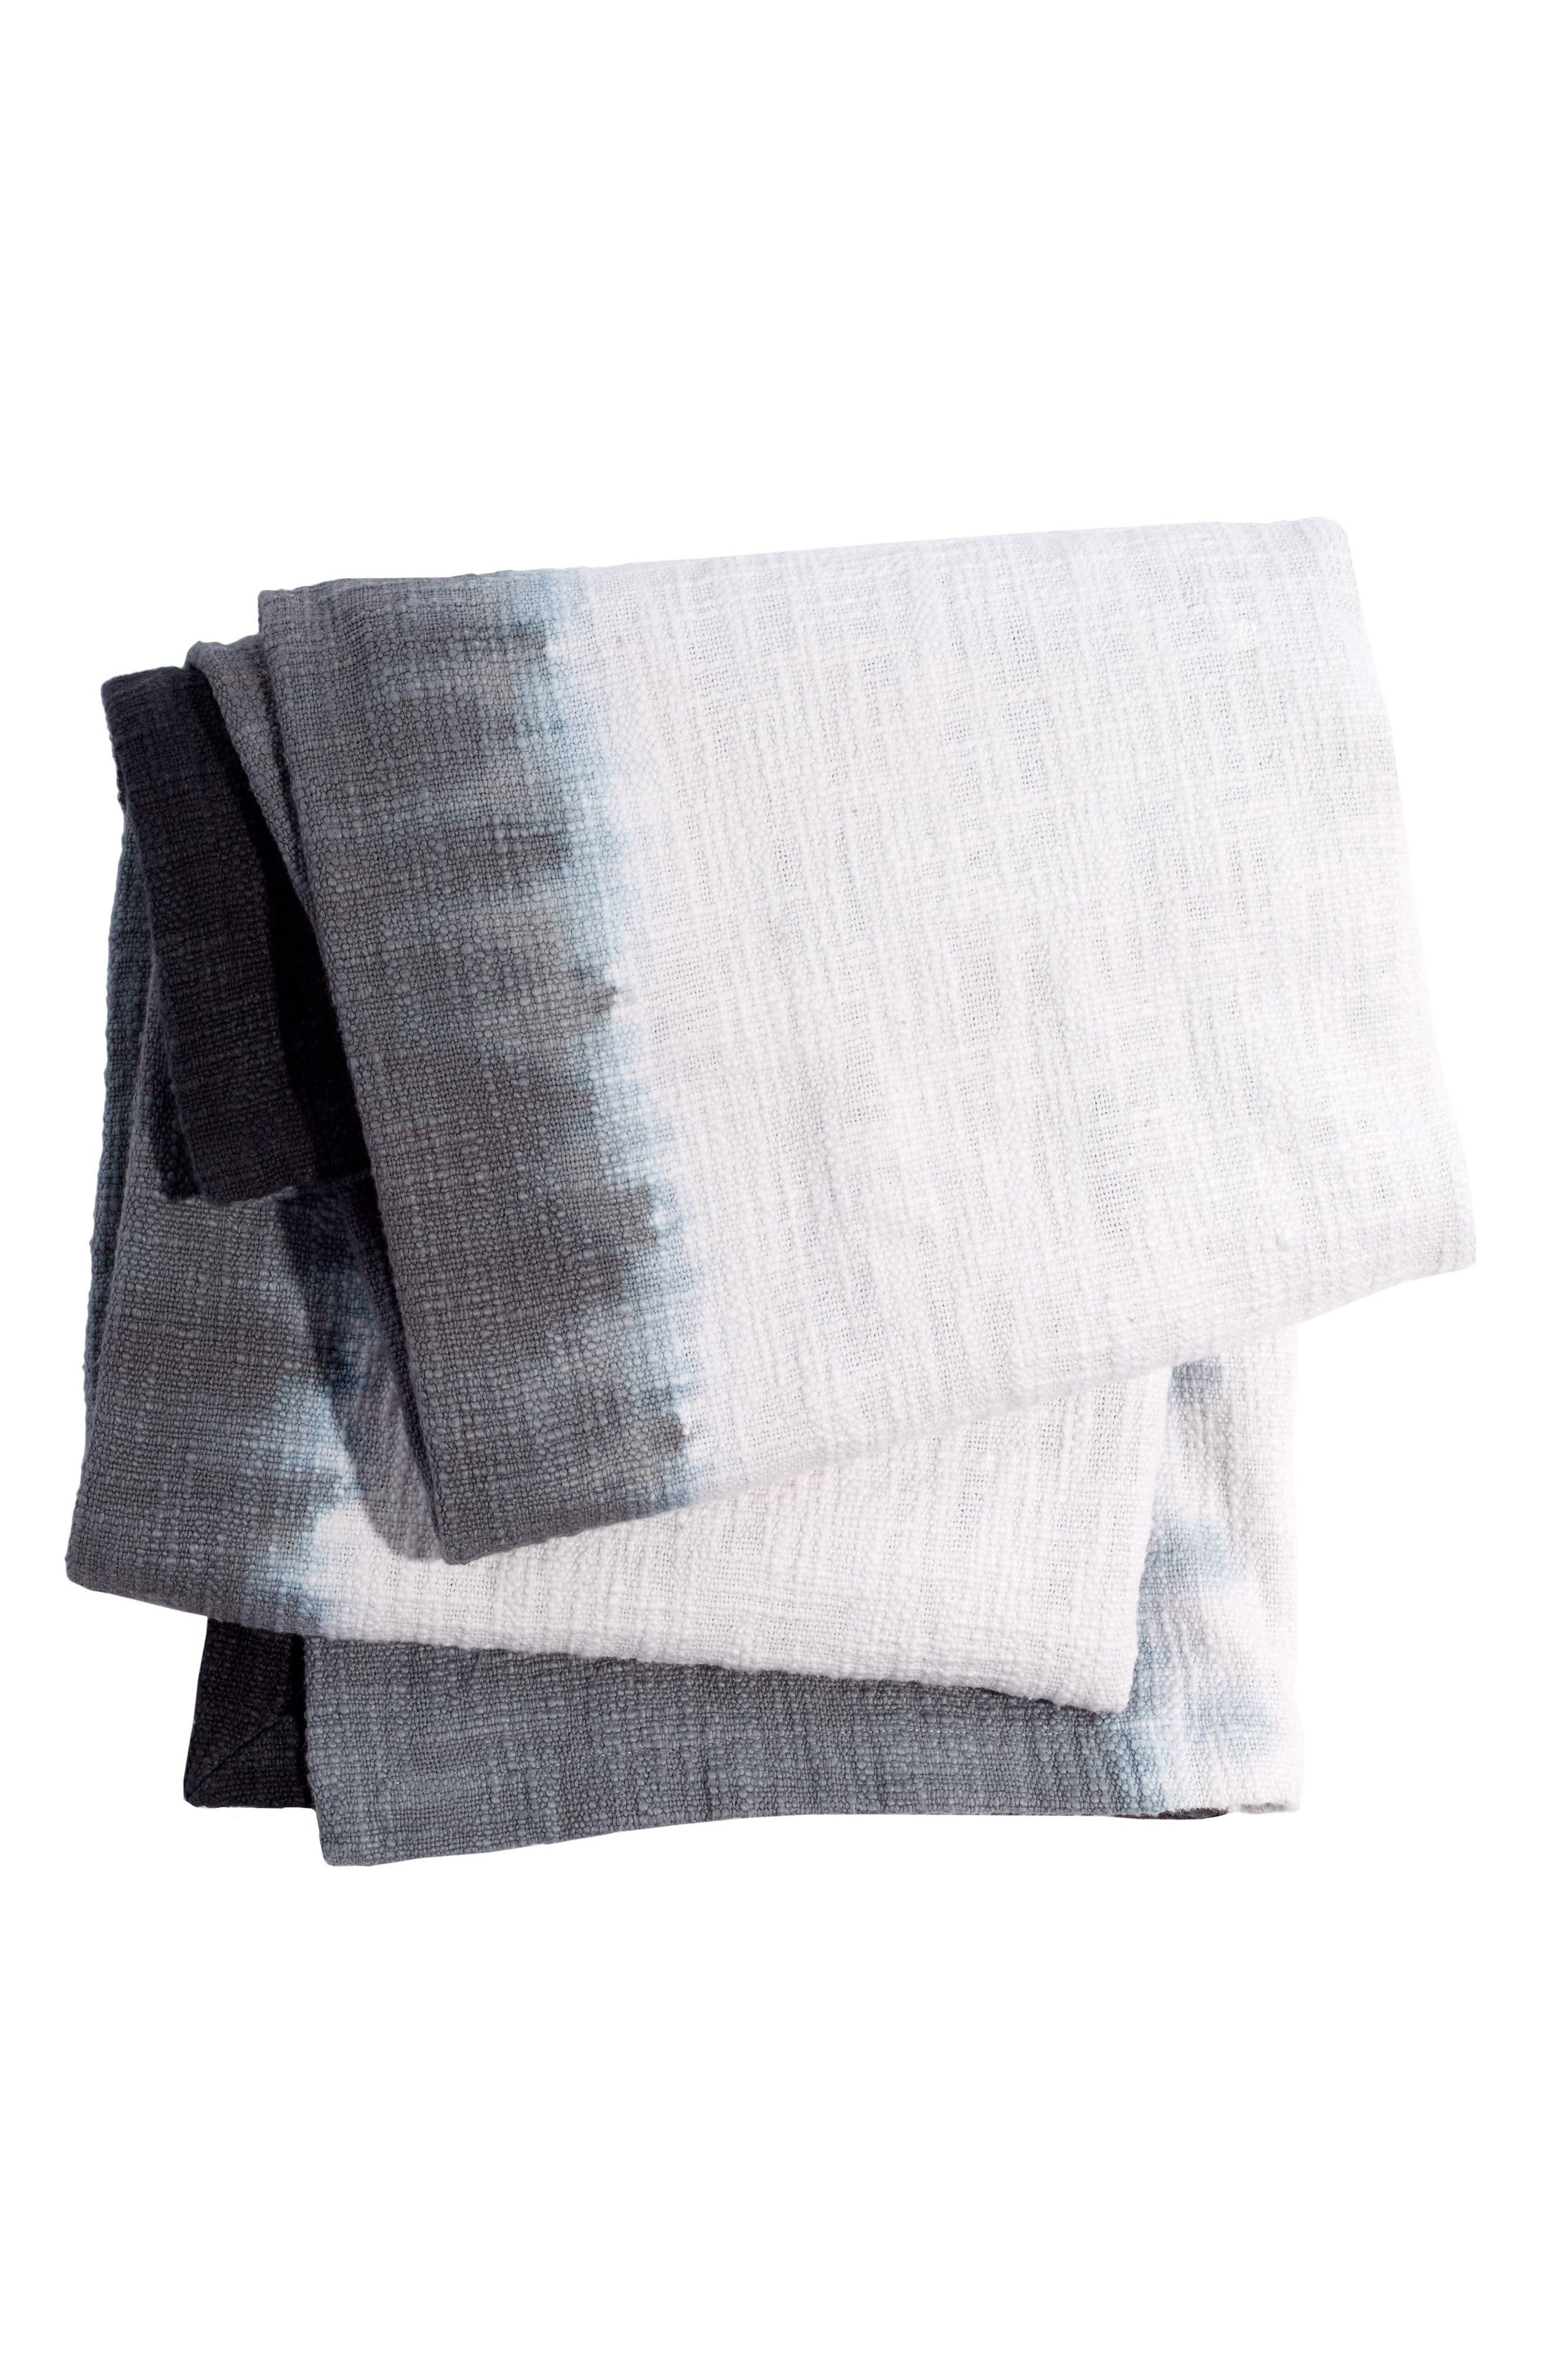 Maneka Dip Dye Throw Blanket,                             Main thumbnail 1, color,                             Grey/ White